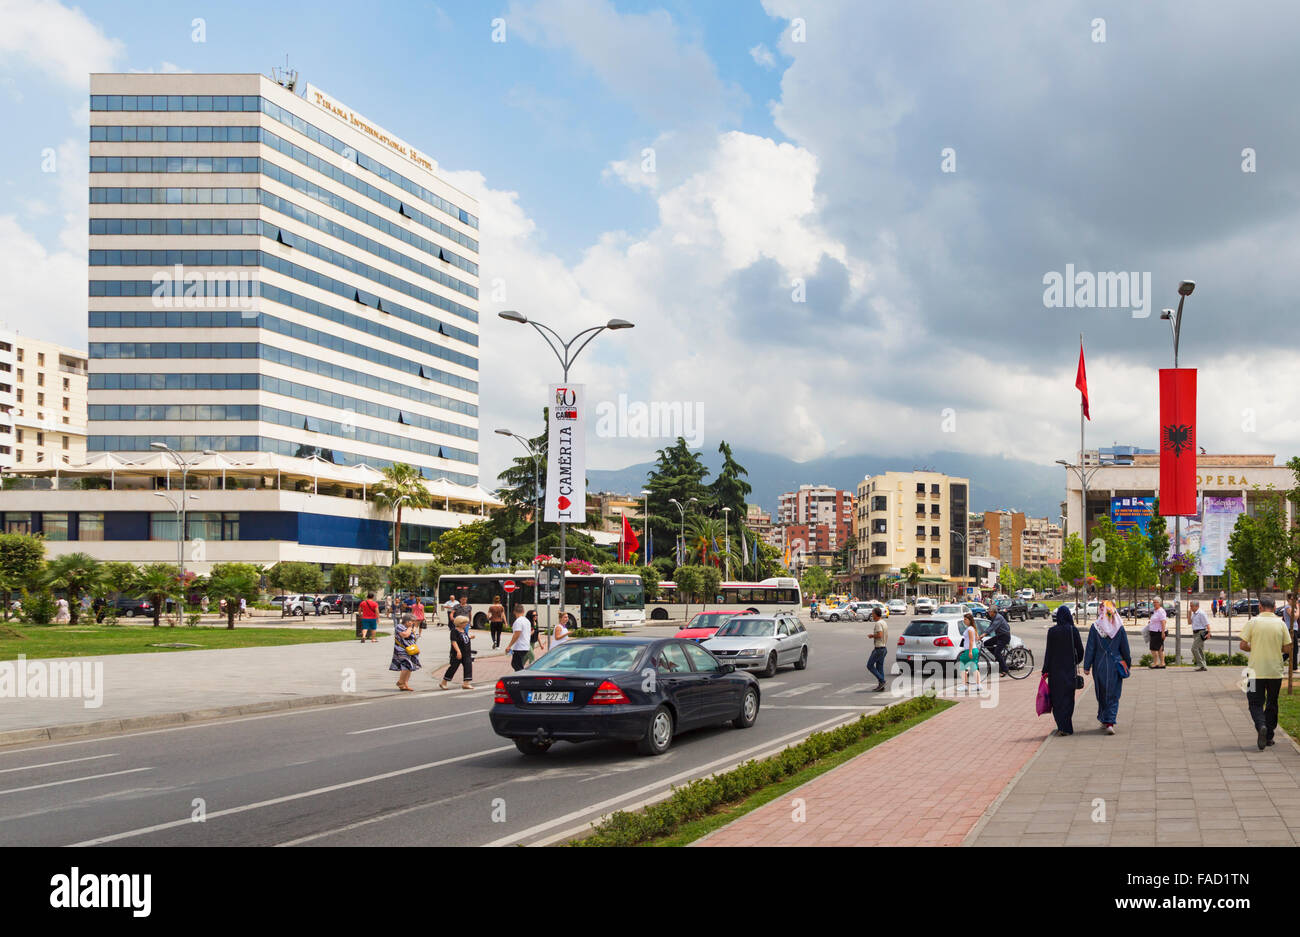 Tirana, Albanie. Rruga e Durresit, ou Durrës Street. L'une des principales artères de la capitale. Photo Stock